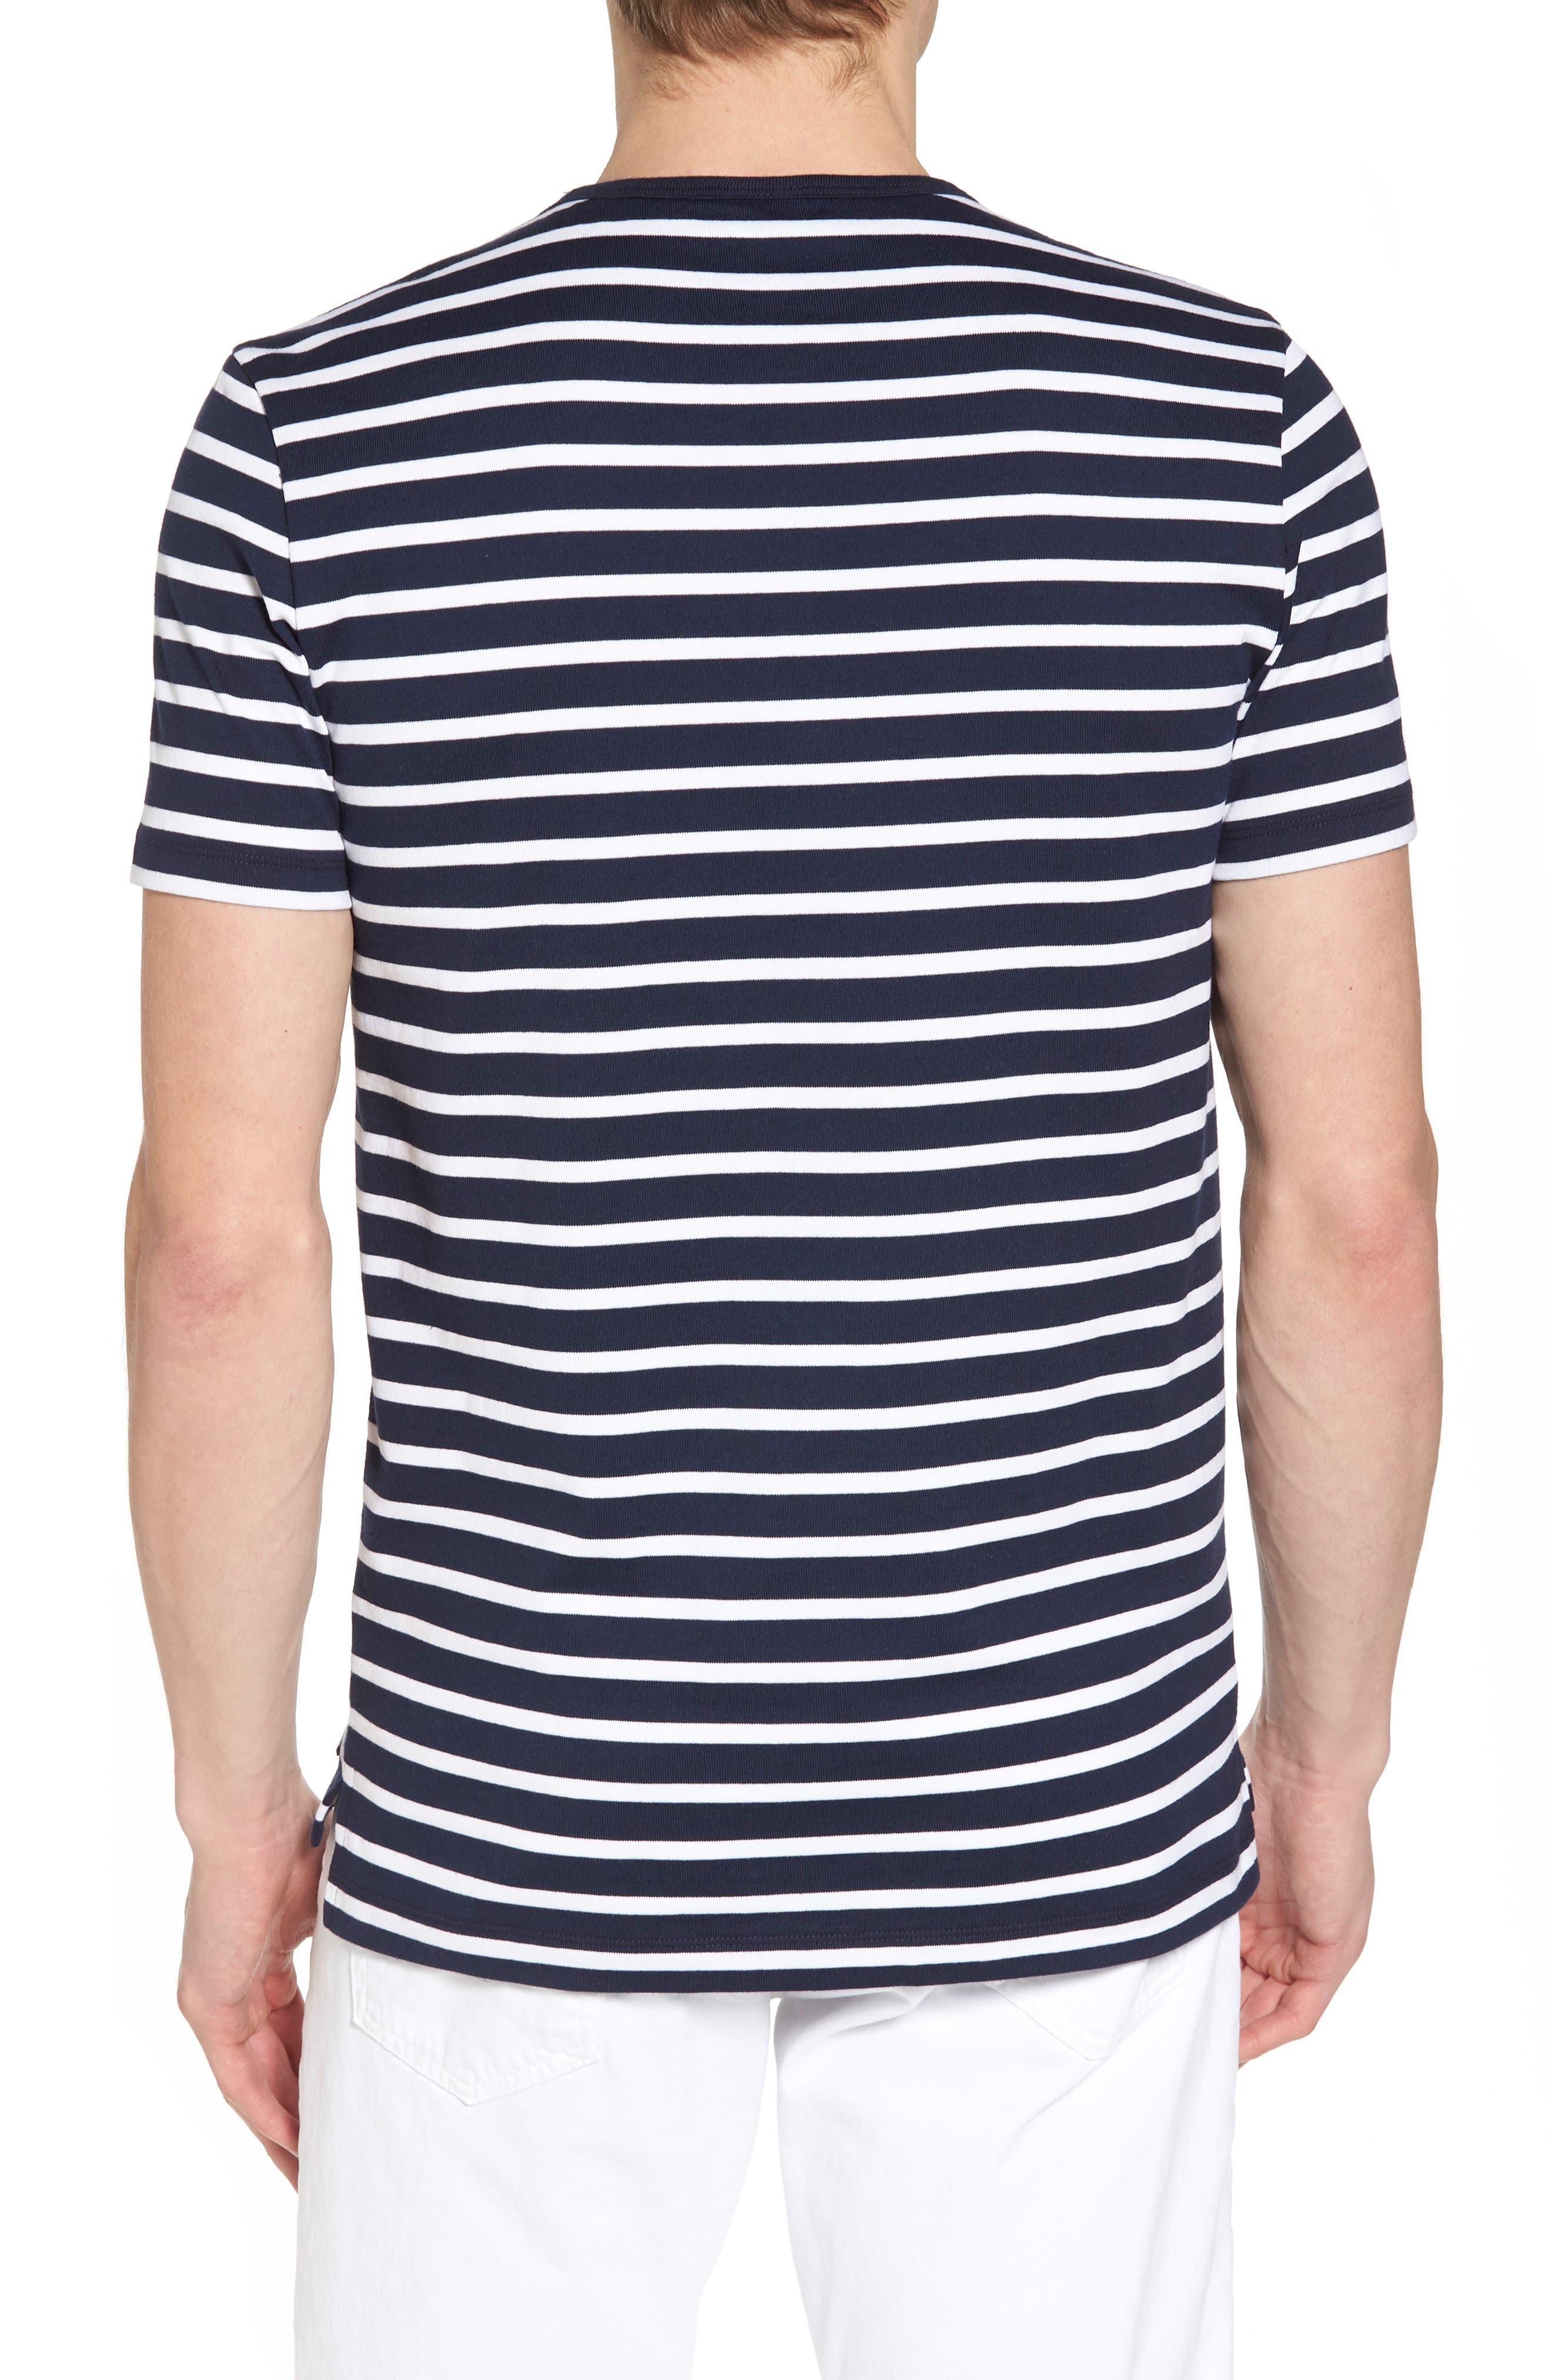 Tessler Stripe Crewneck T-Shirt,                             Alternate thumbnail 2, color,                             410